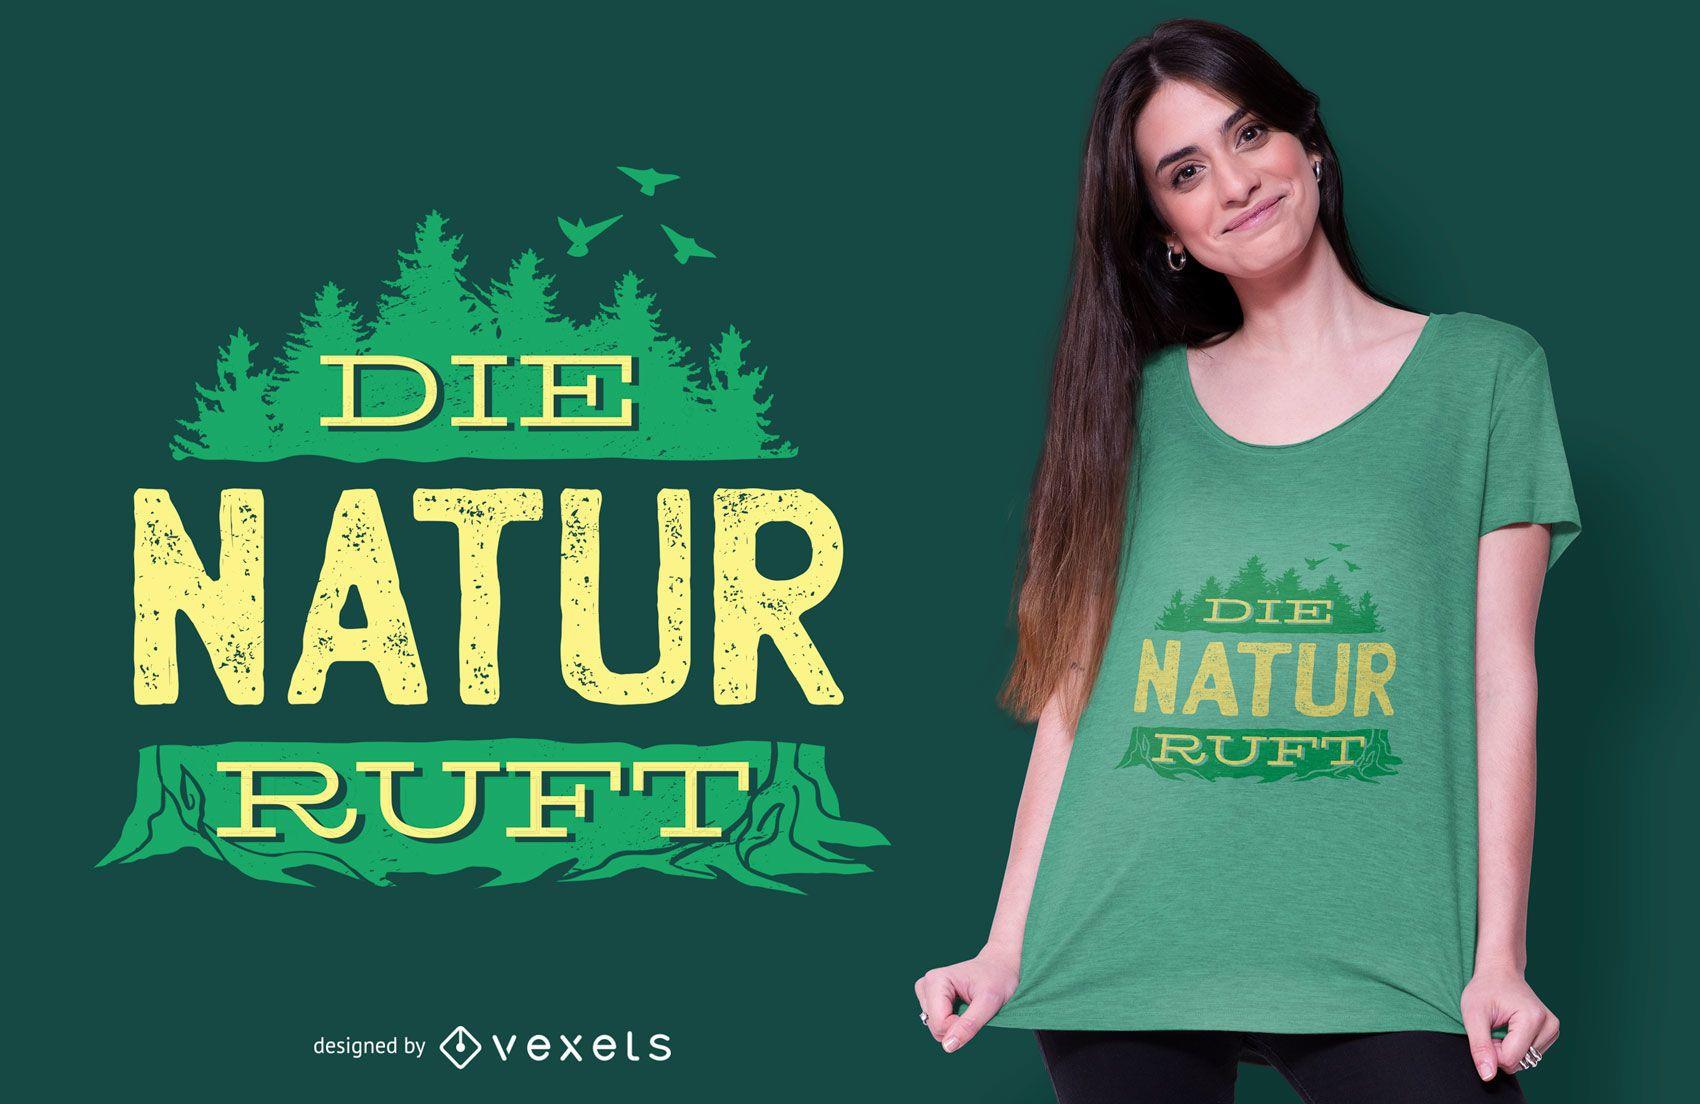 Call of Nature German T-shirt Design